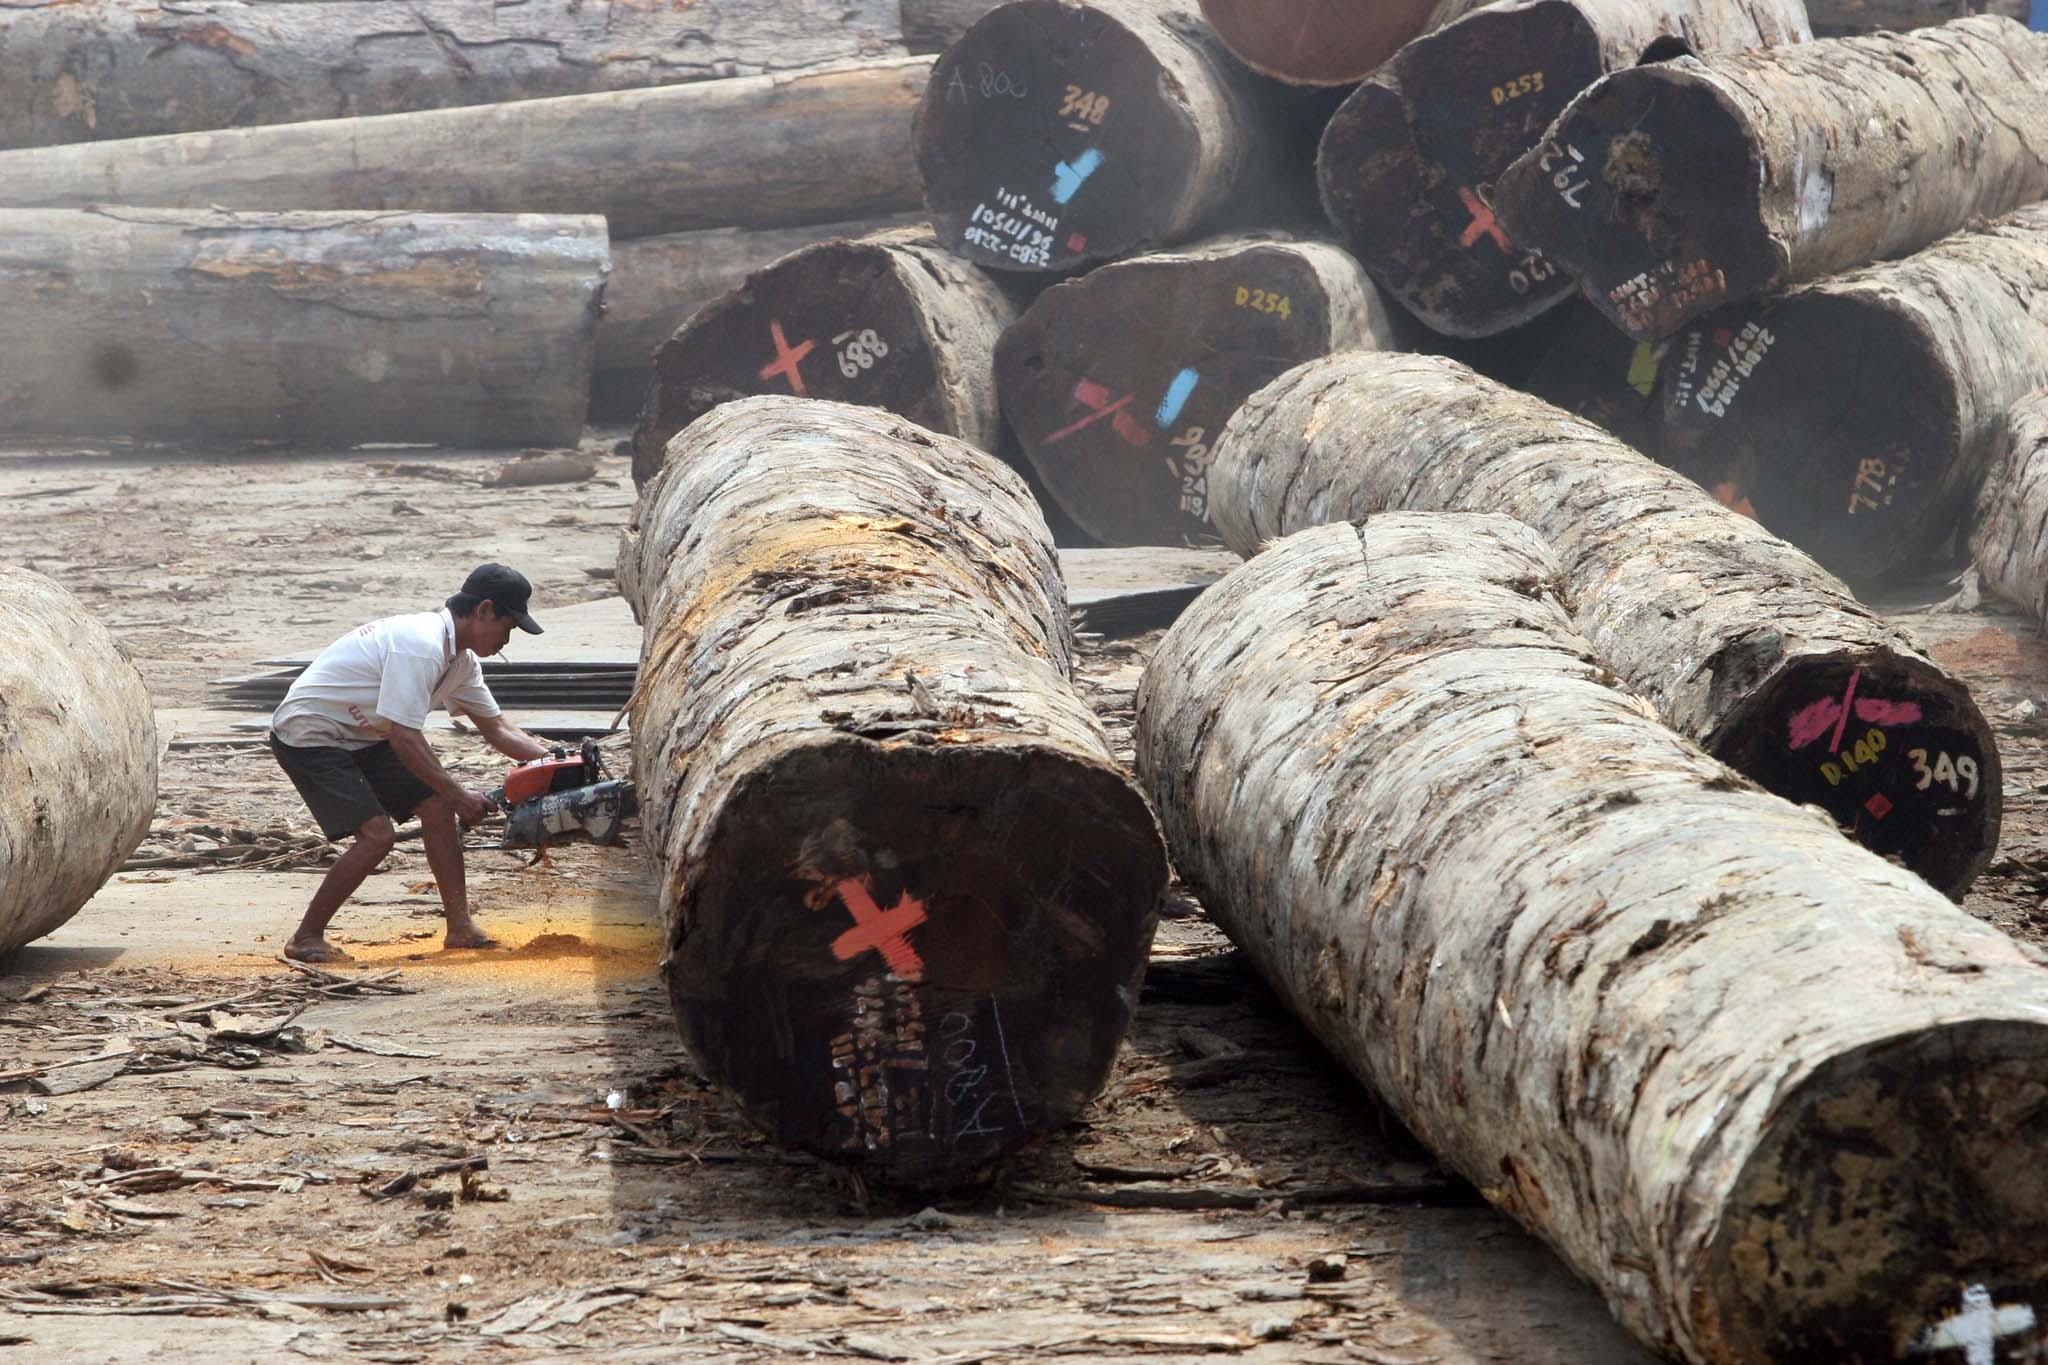 Kalangan produsen furnitur dan kerajinan rotan menilai, masih adanya kendala yang dihadapi Indonesia dalam kegiatan ekspor produk hasil kayu dan rotan ke Uni Eropa (UE) menunjukkan penerapan Sistem Verifikasi Legalitas…